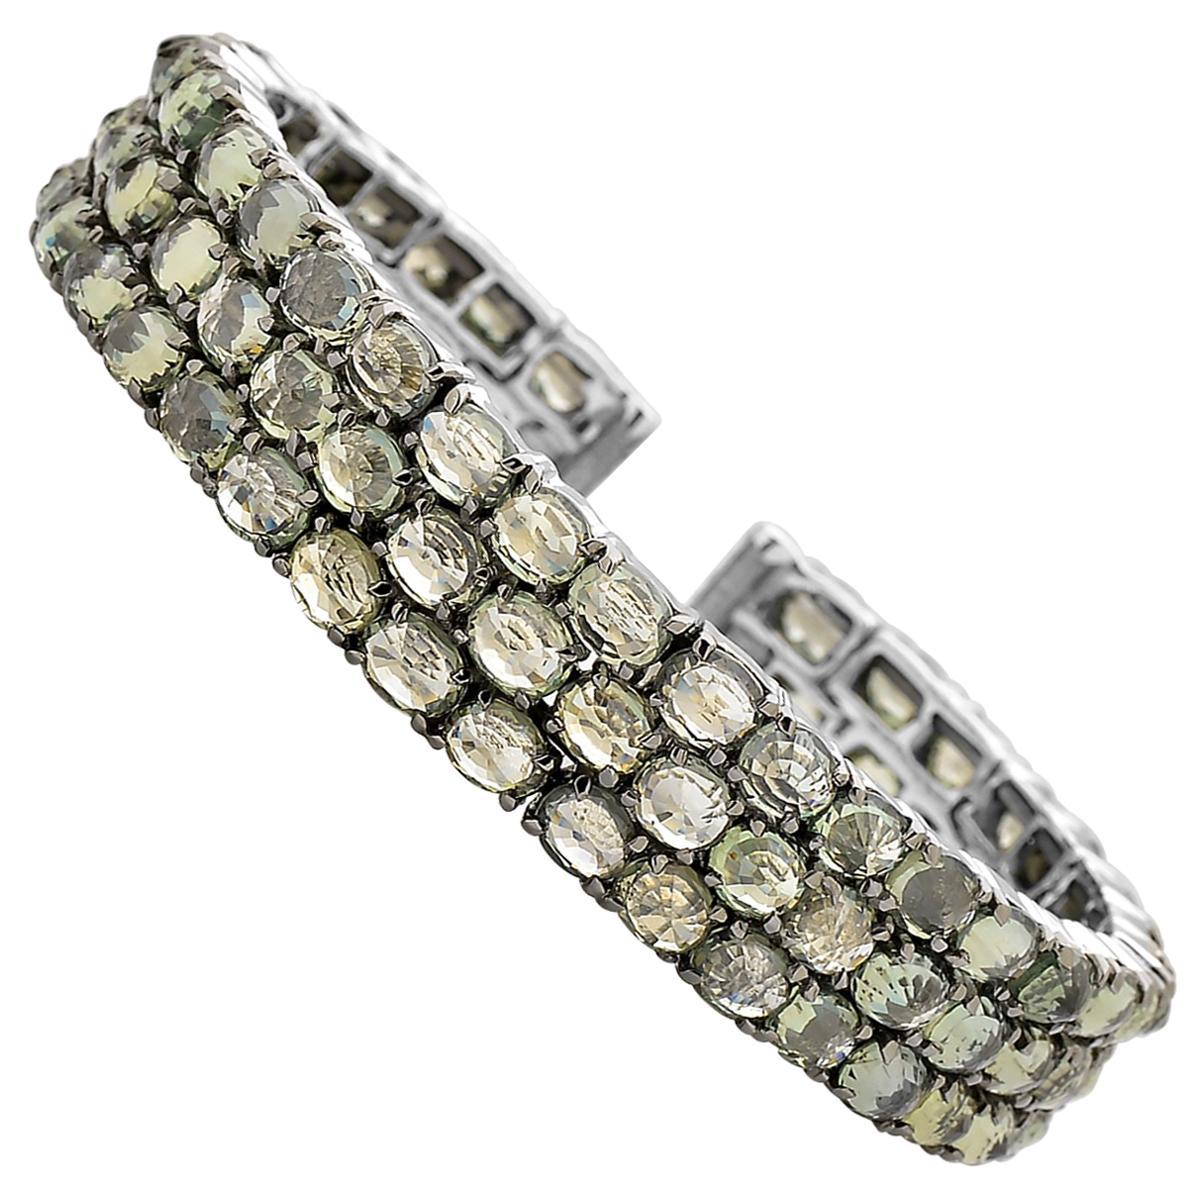 Paolo Costagli 18 Karat White Gold Green Sapphire and Diamond Cuff Bracelet